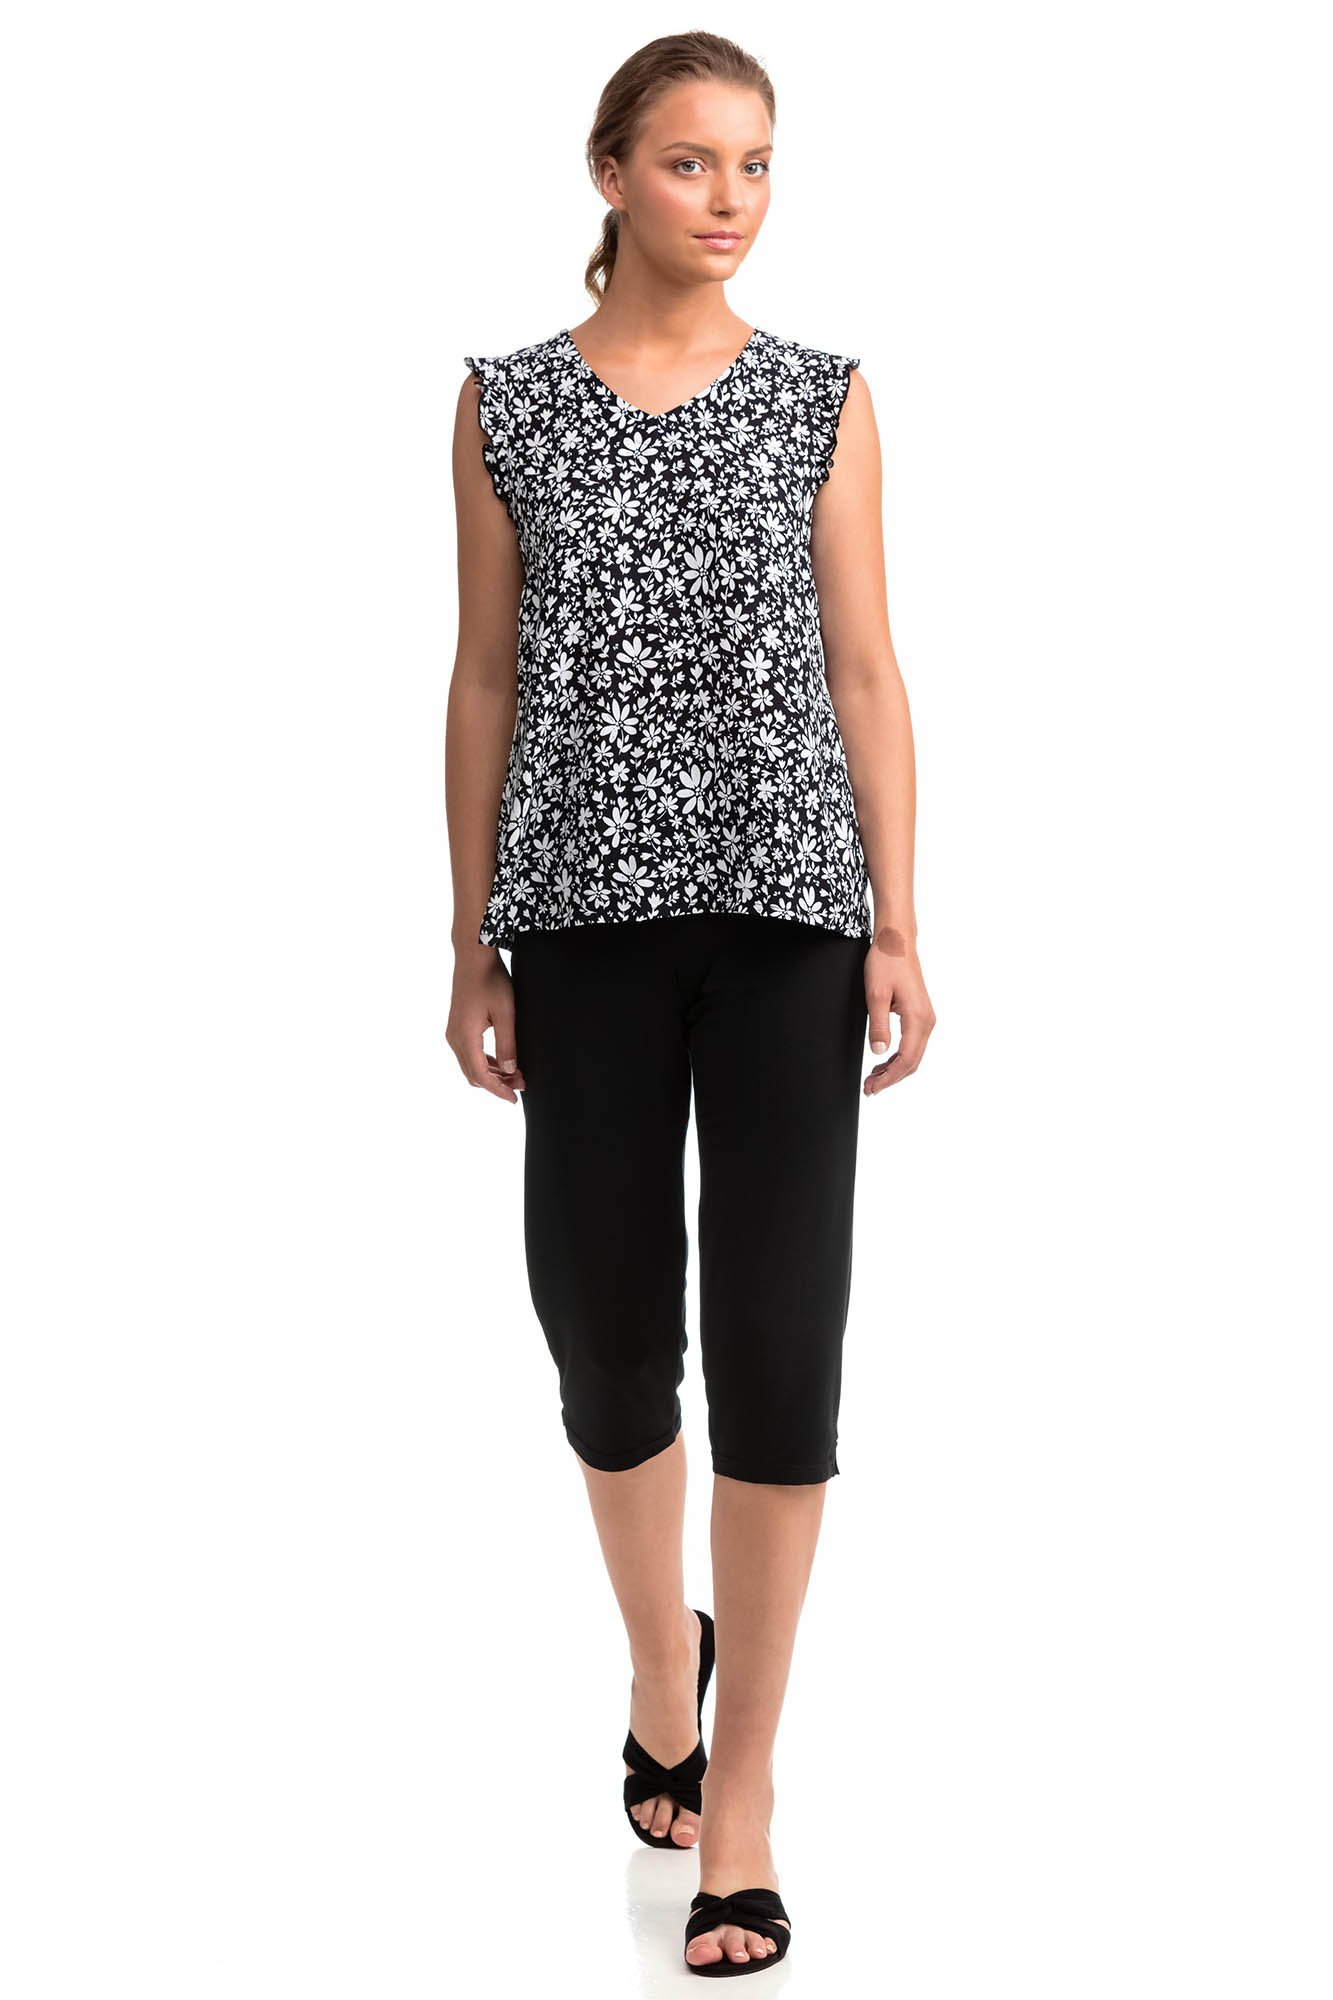 Vamp - Dámske pyžamo 14056 - Vamp black xl